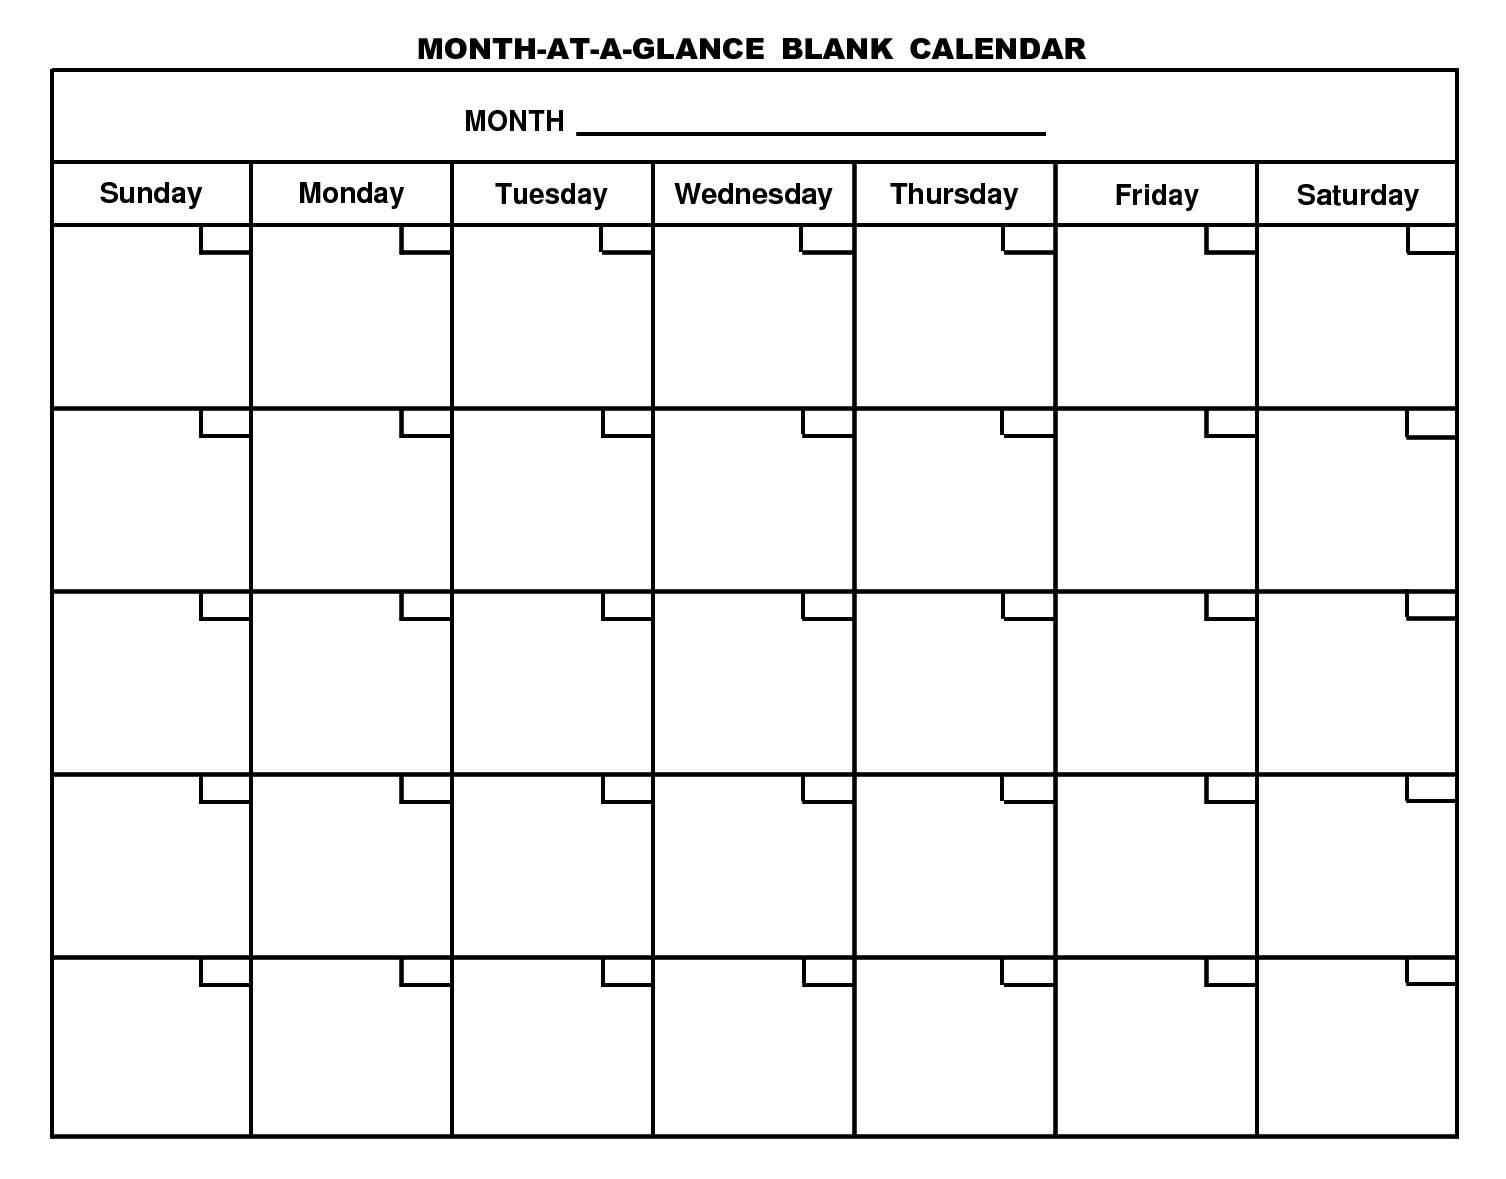 Pinstacy Tangren On Work | Blank Monthly Calendar